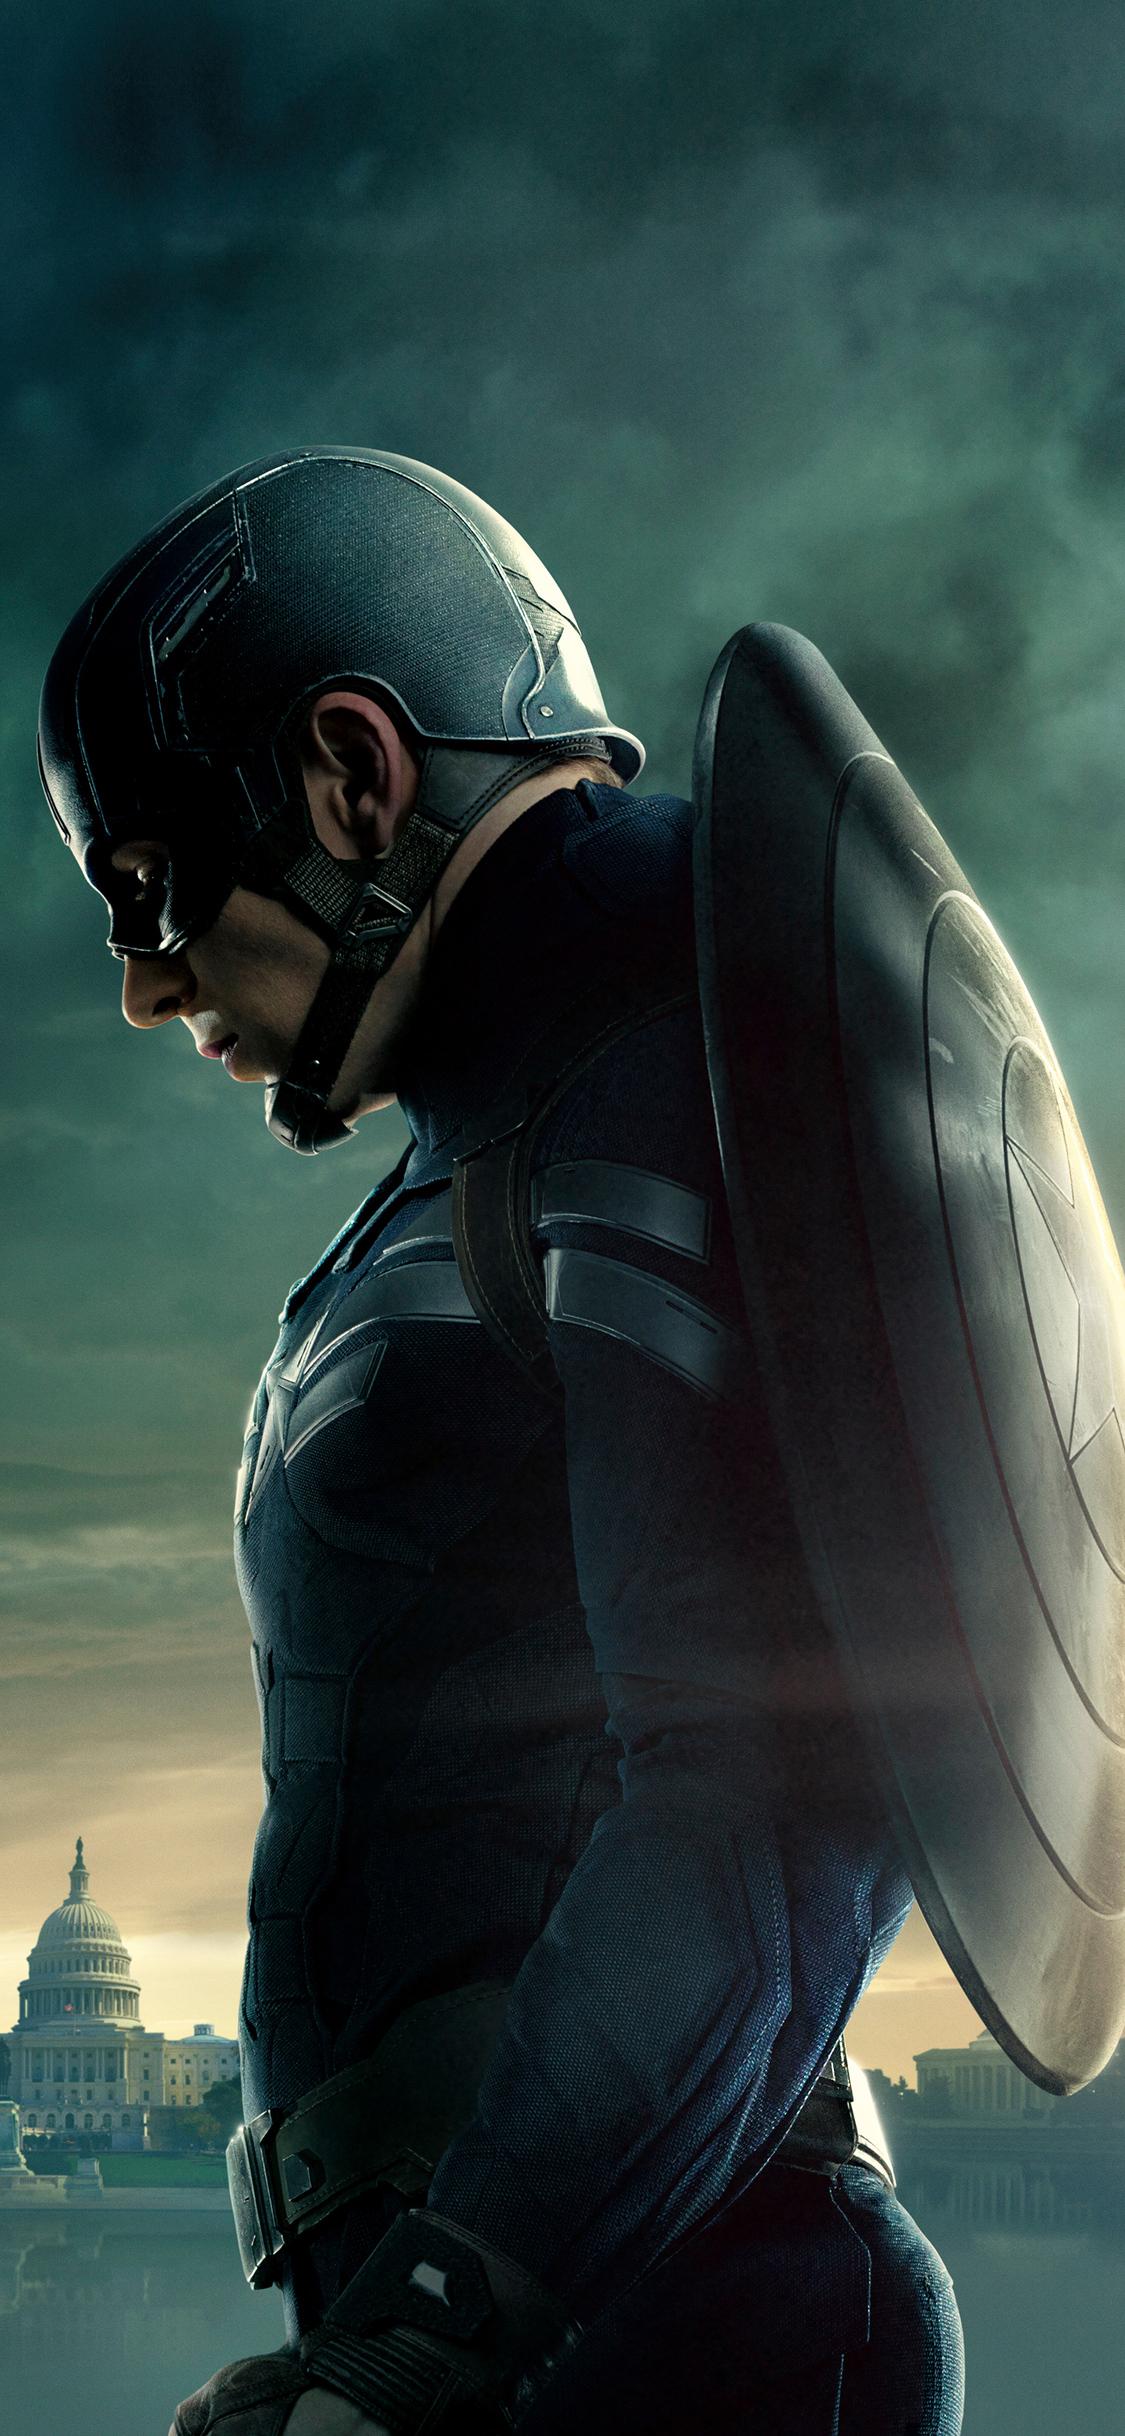 27+ Captain America Iphone Wallpaper 4k - Bizt Wallpaper